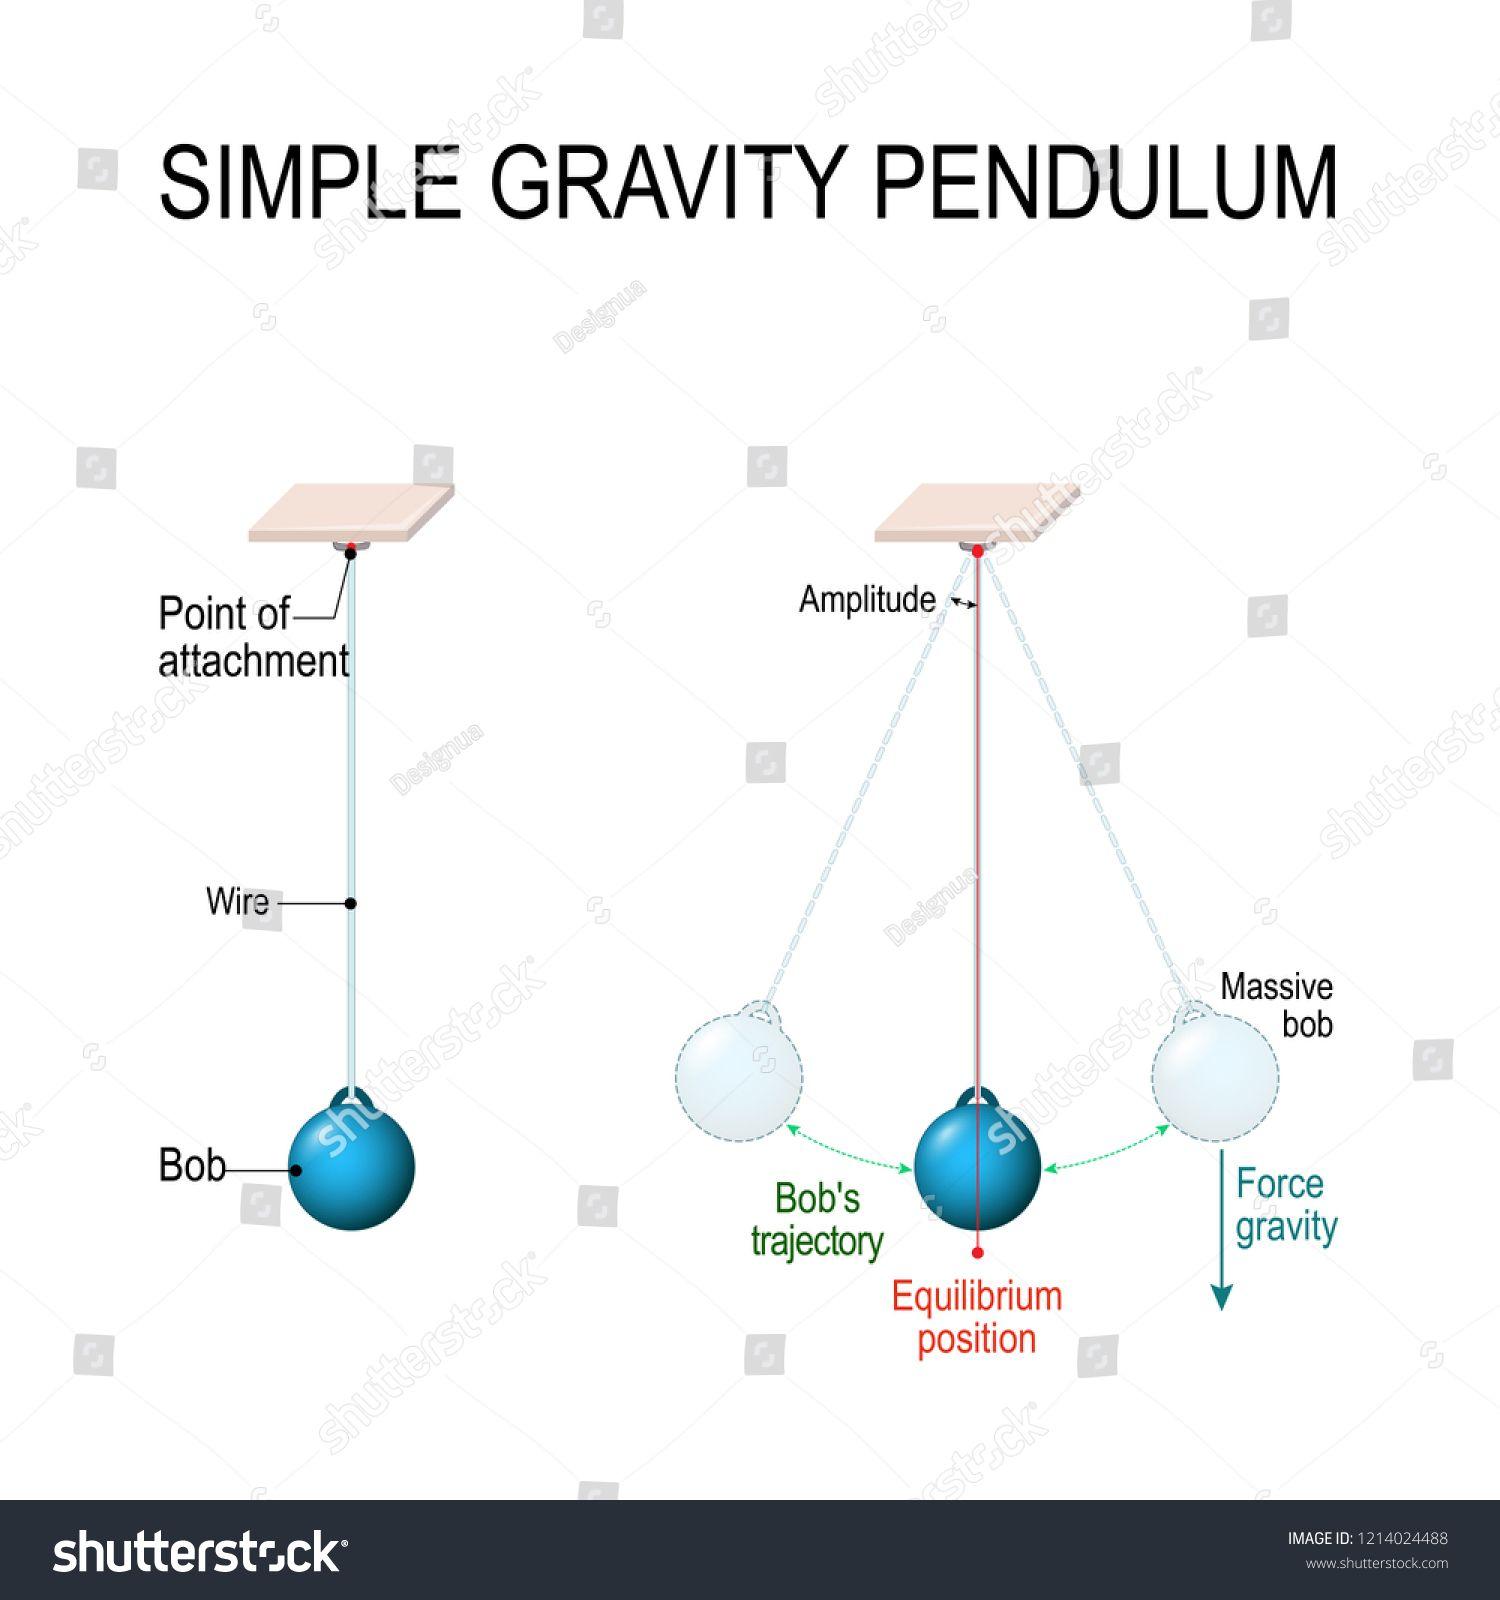 Simple Gravity Pendulum Conservation Of Energy When Pendulum